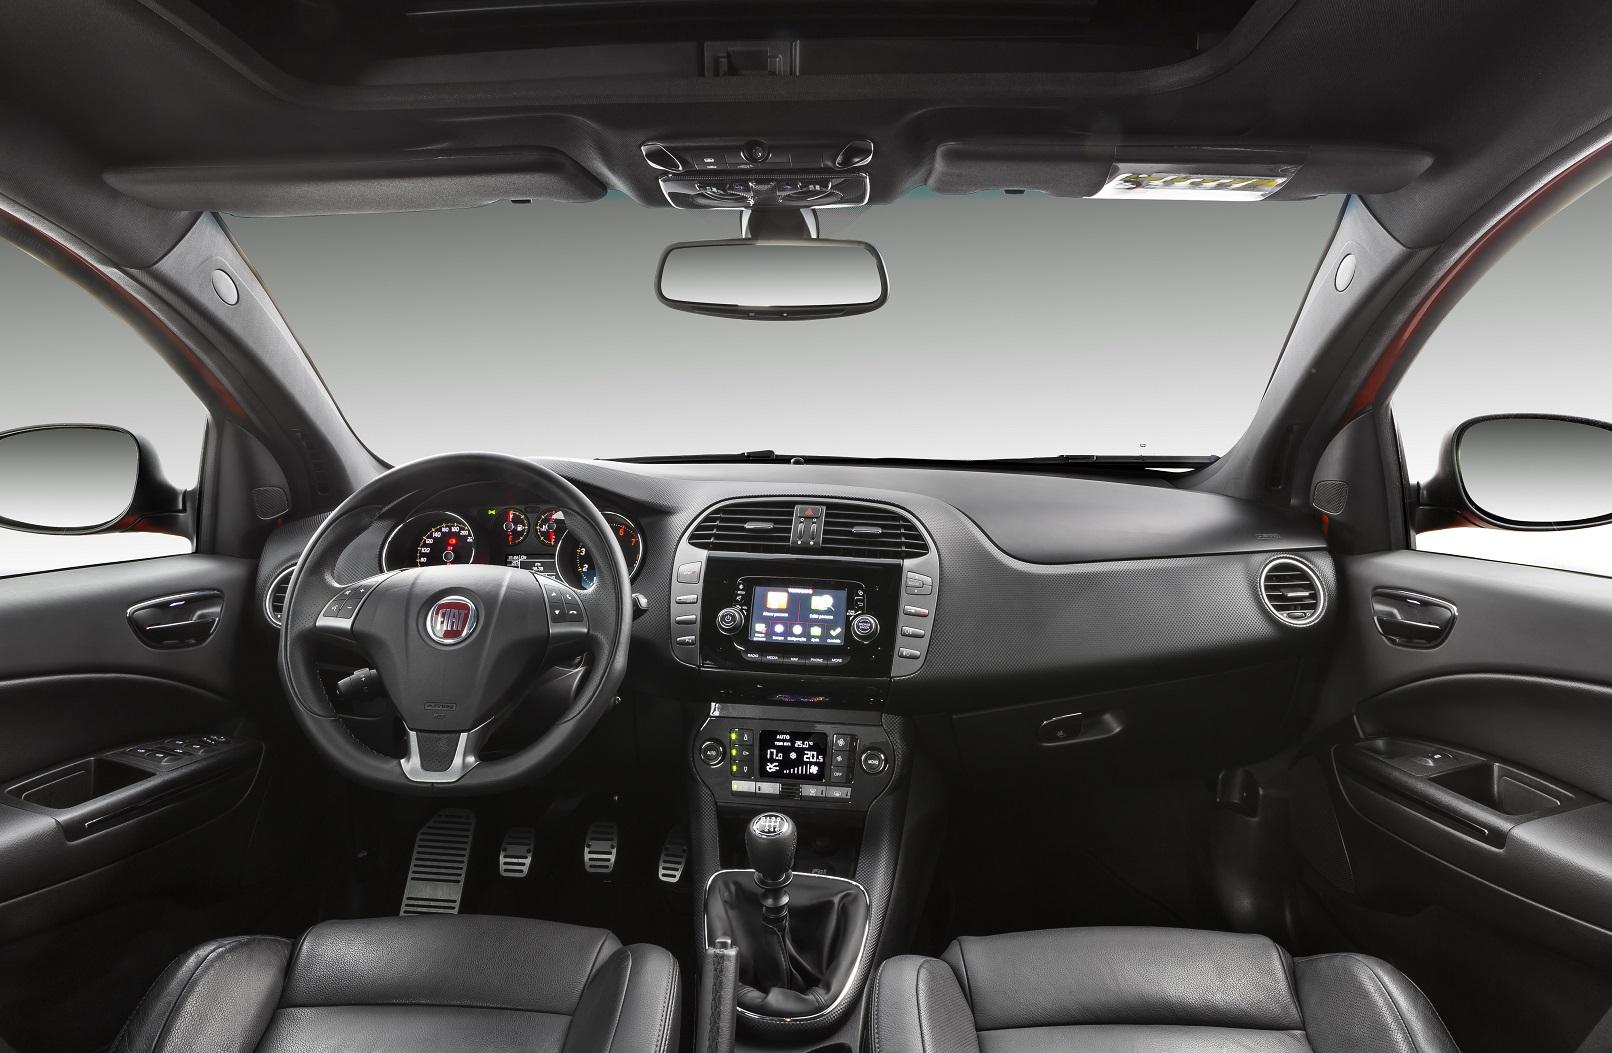 Fiat Bravo T-Jet 2015/16 já raz visual reestilizado, além do motor 1.4 turbo de 152 cv de potência